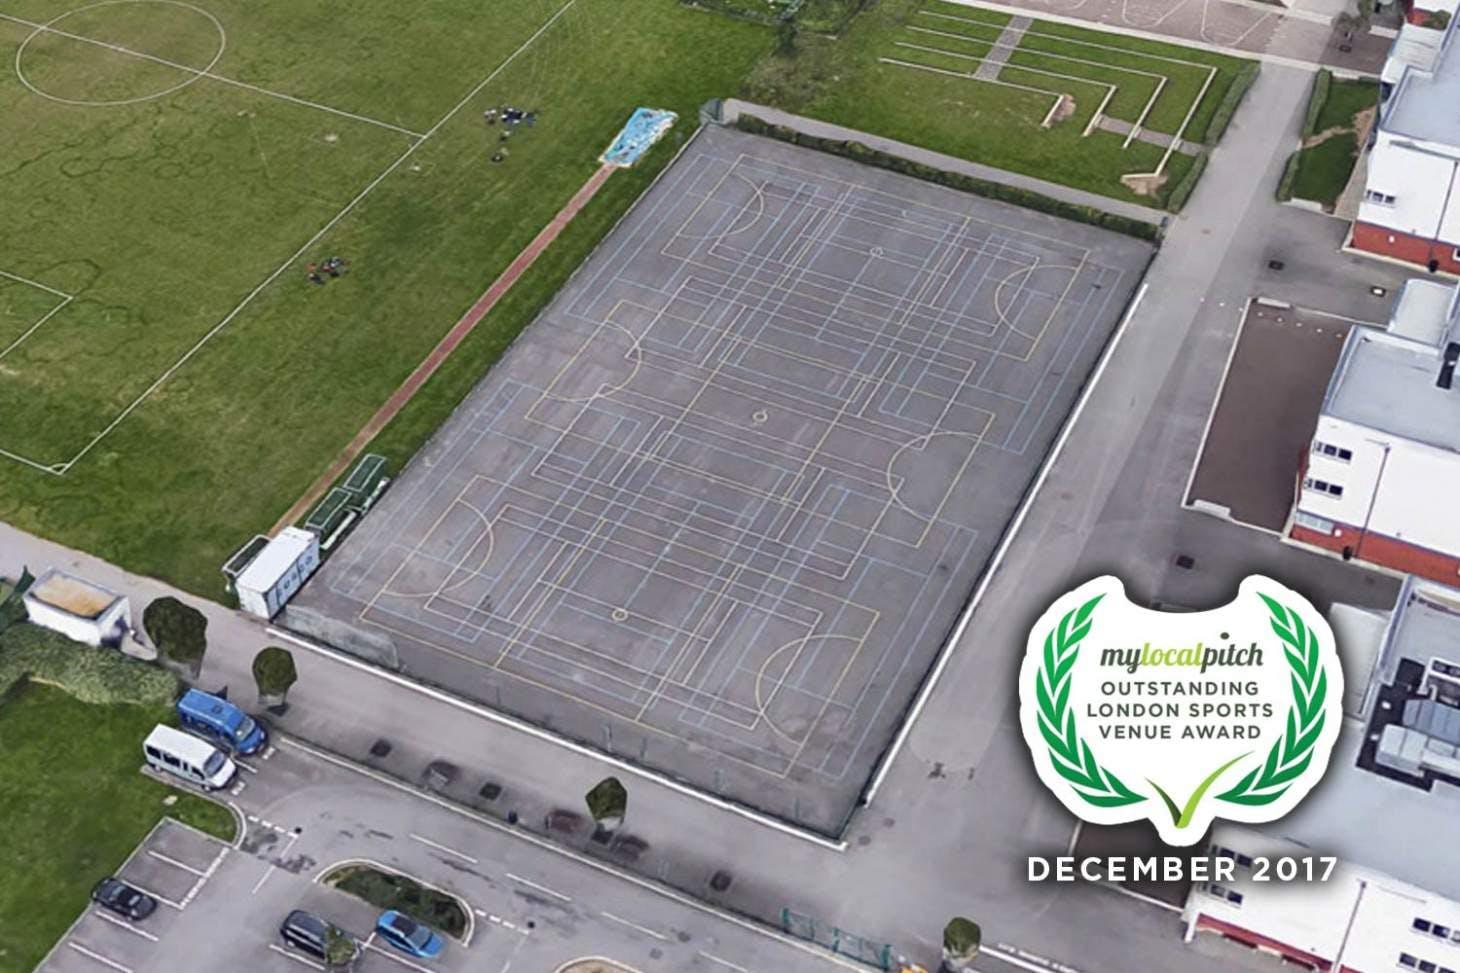 Castle Green Leisure Centre Outdoor | Hard (macadam) tennis court